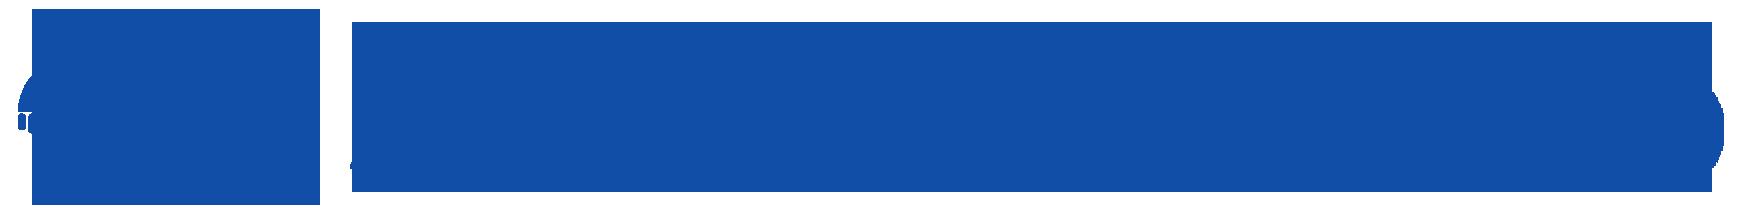 SendBeatsTo Blue Logo Landscape, Typography, Transparent Background